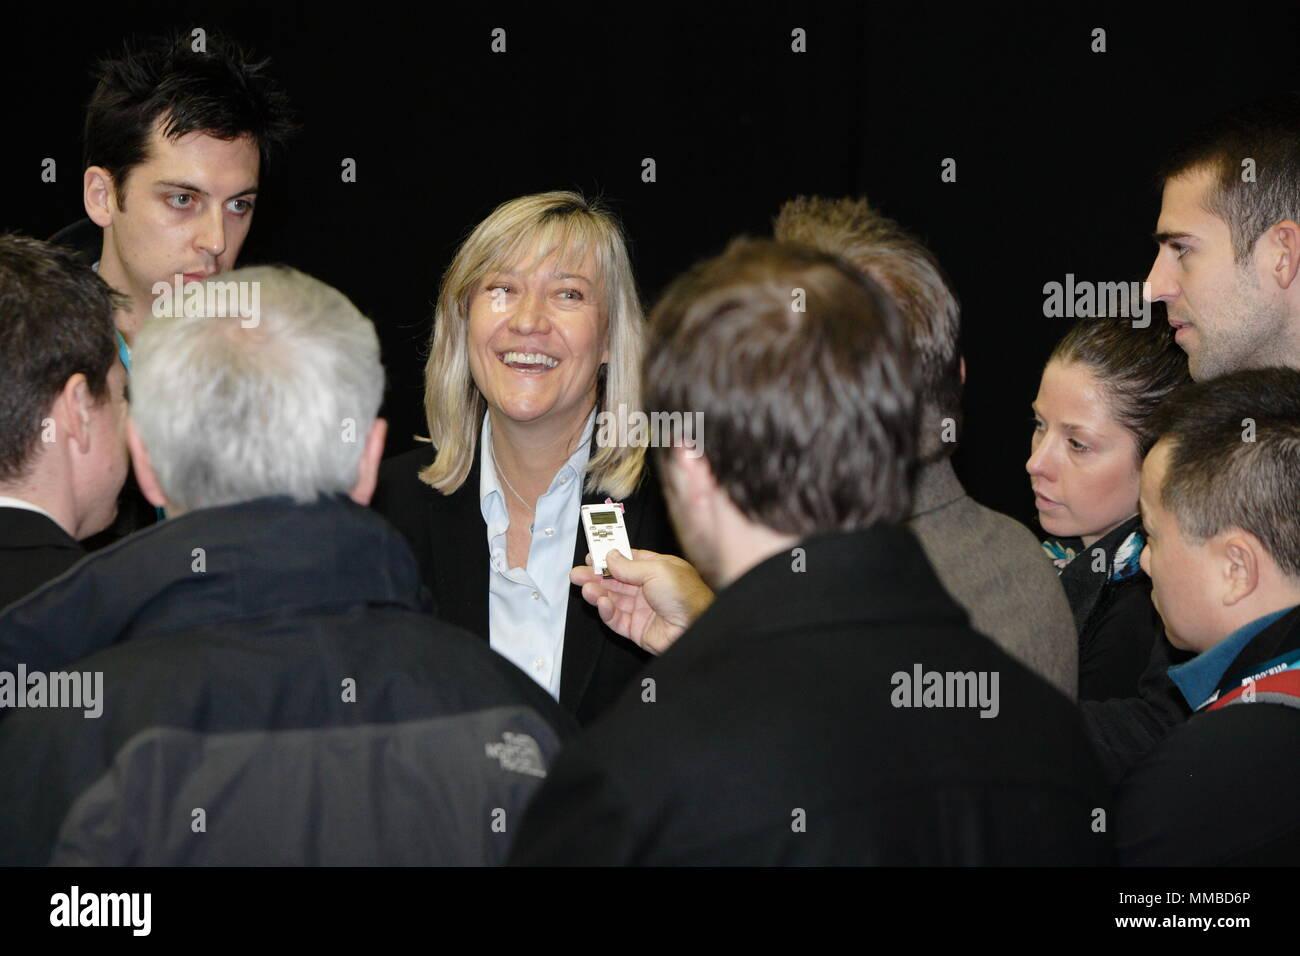 UK Sport - London 2012 Olympic test event Table Tennis, Debbie Jevans, director of sport Games organisers Locog gives media interviews, Excel London. 23 November 2011 - Stock Image